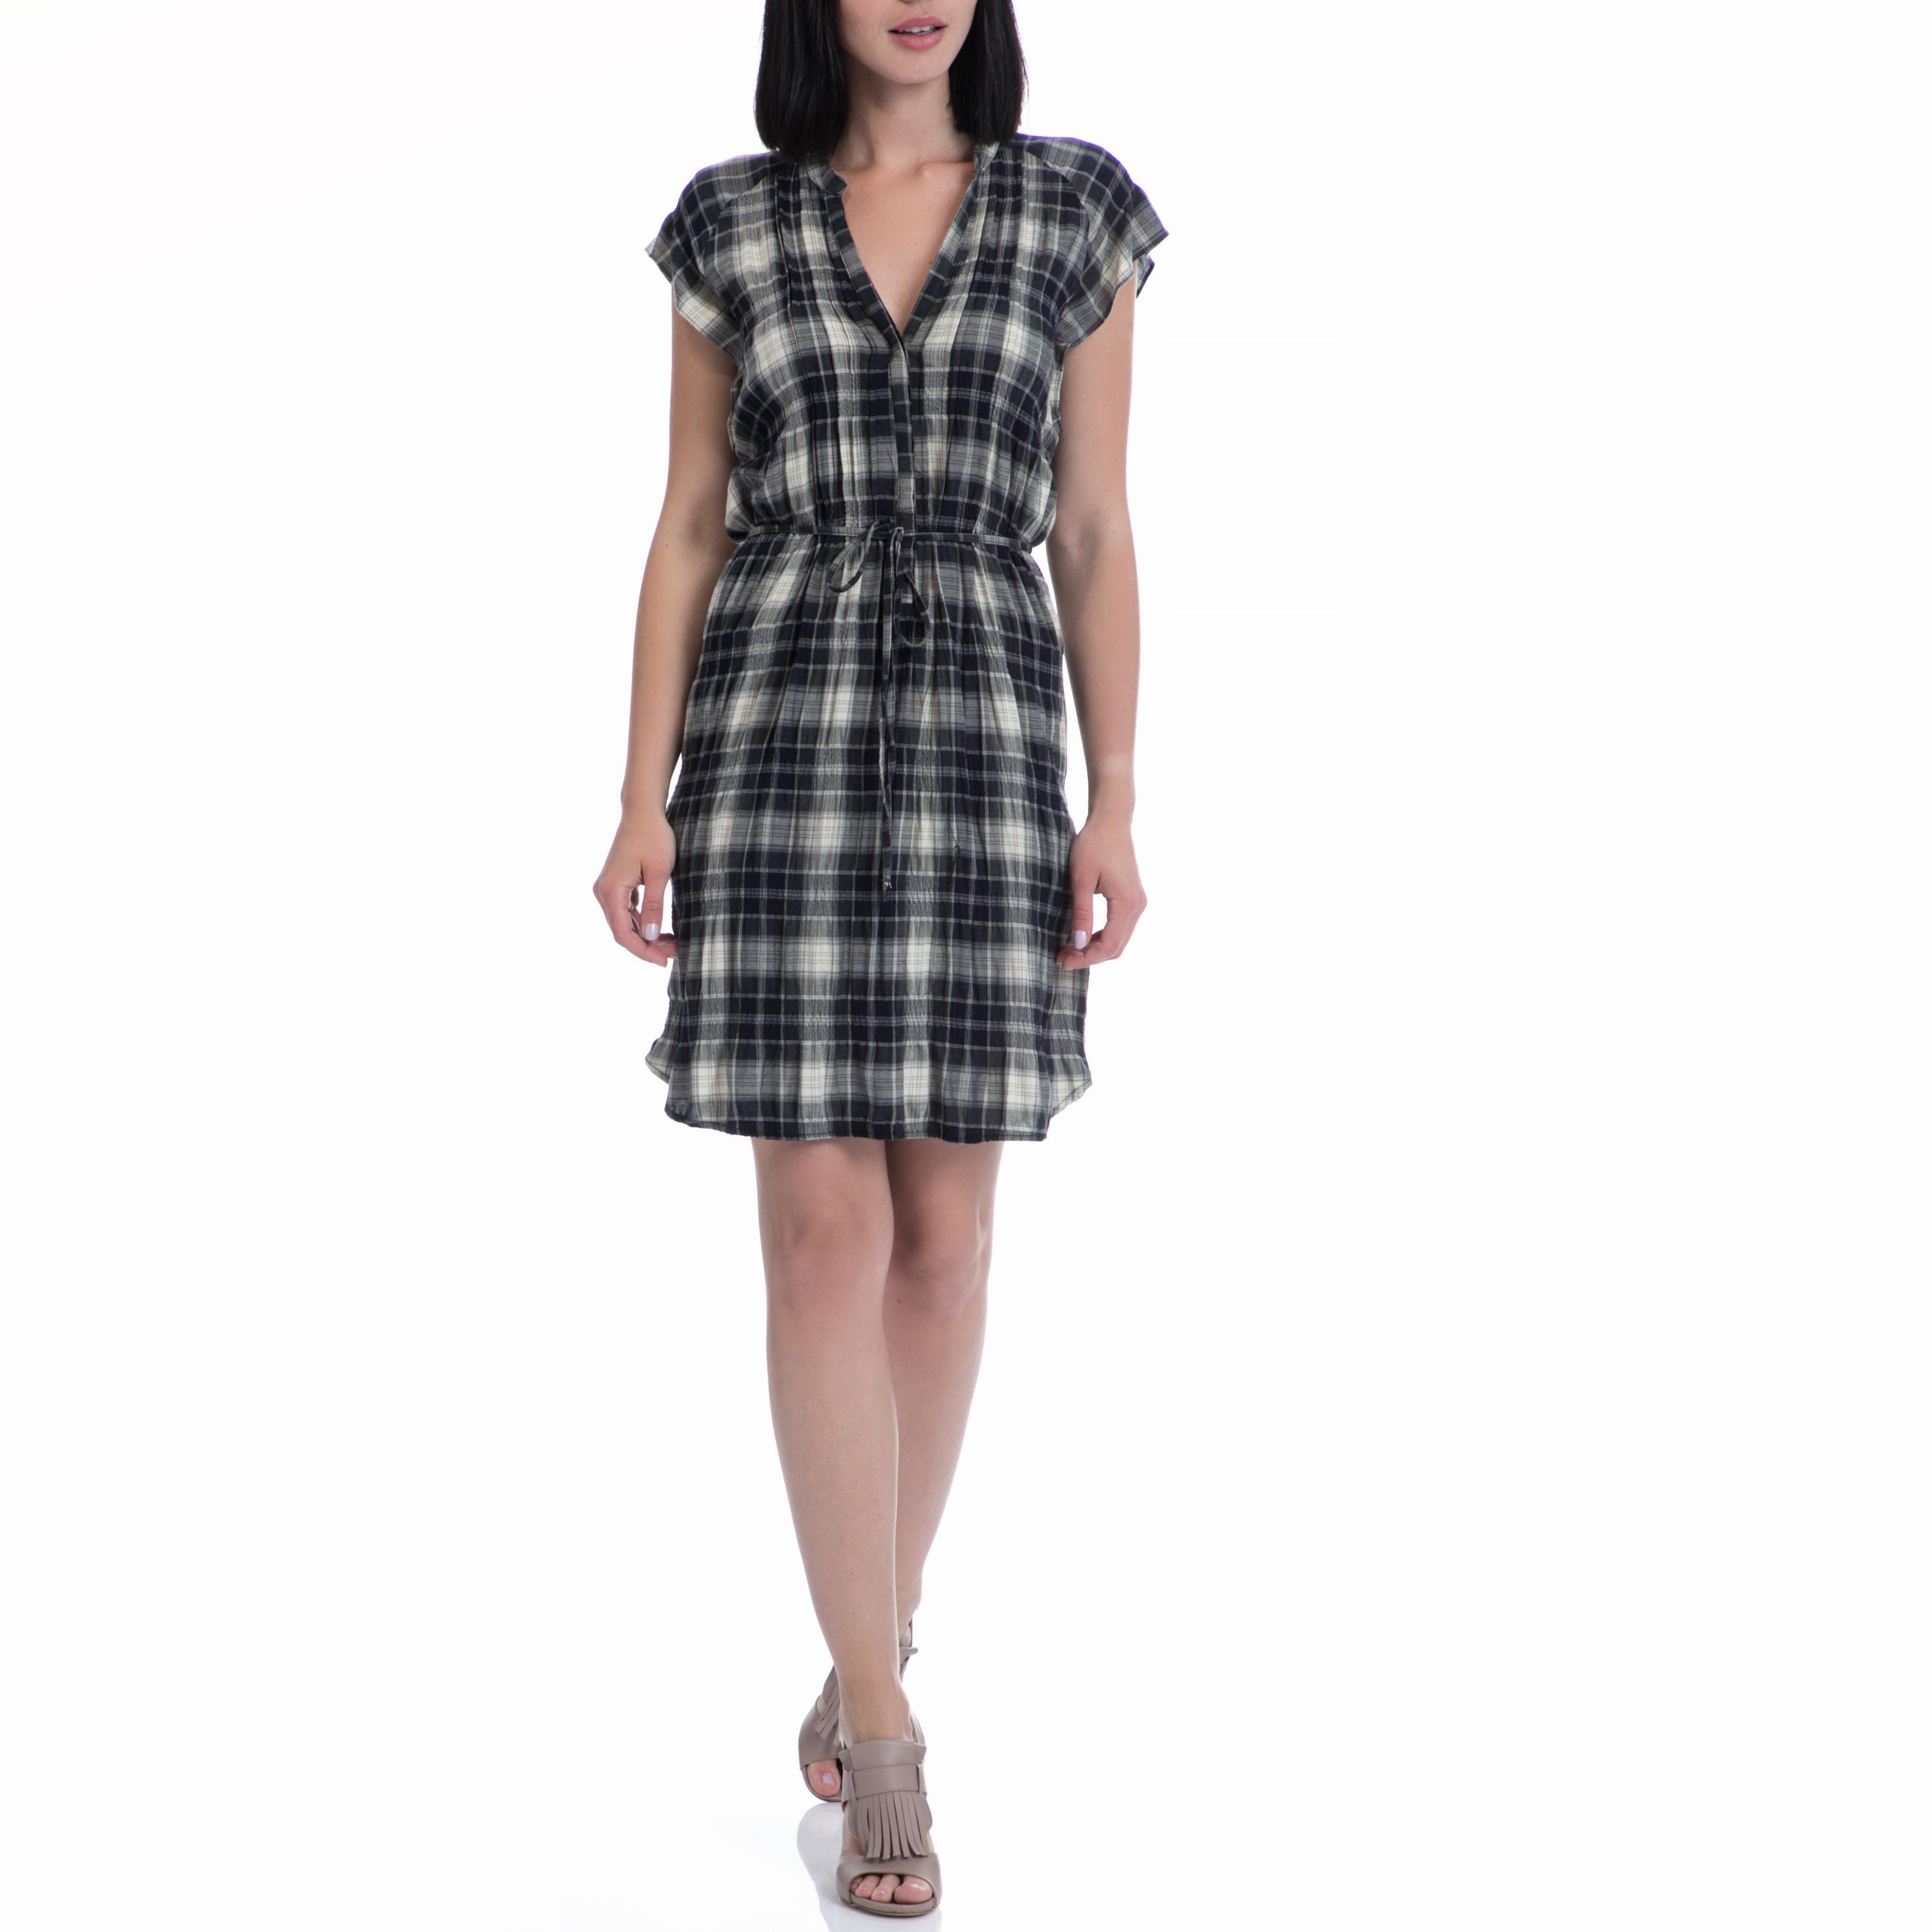 MOTIVI - Φουλάρι MOTIVI μαύρο-γκρι γυναικεία ρούχα φορέματα μίνι